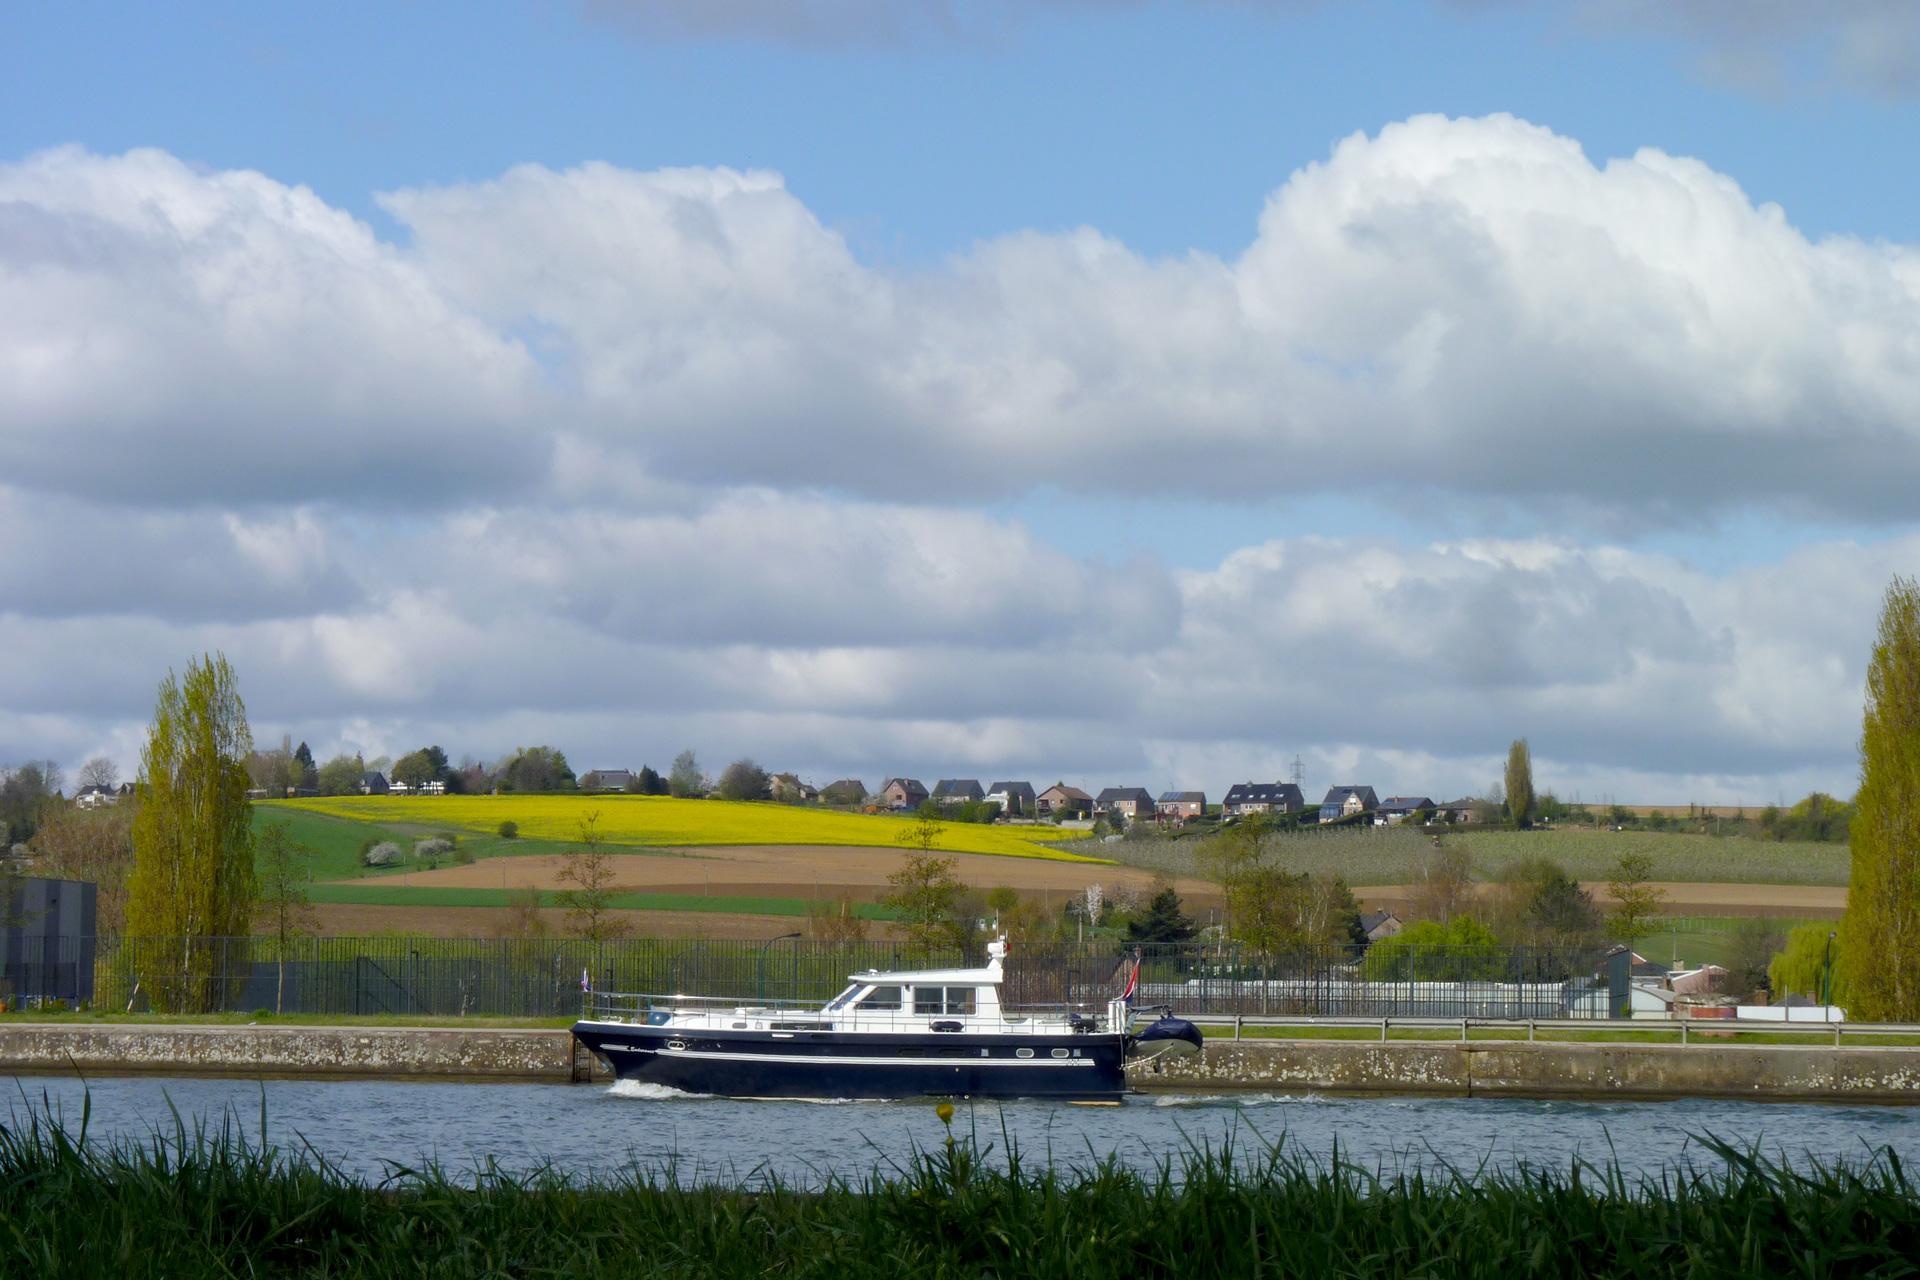 oupeye-le-canal-albert-a-hermalle-sous-argenteau-photo-bernard-jacqmin